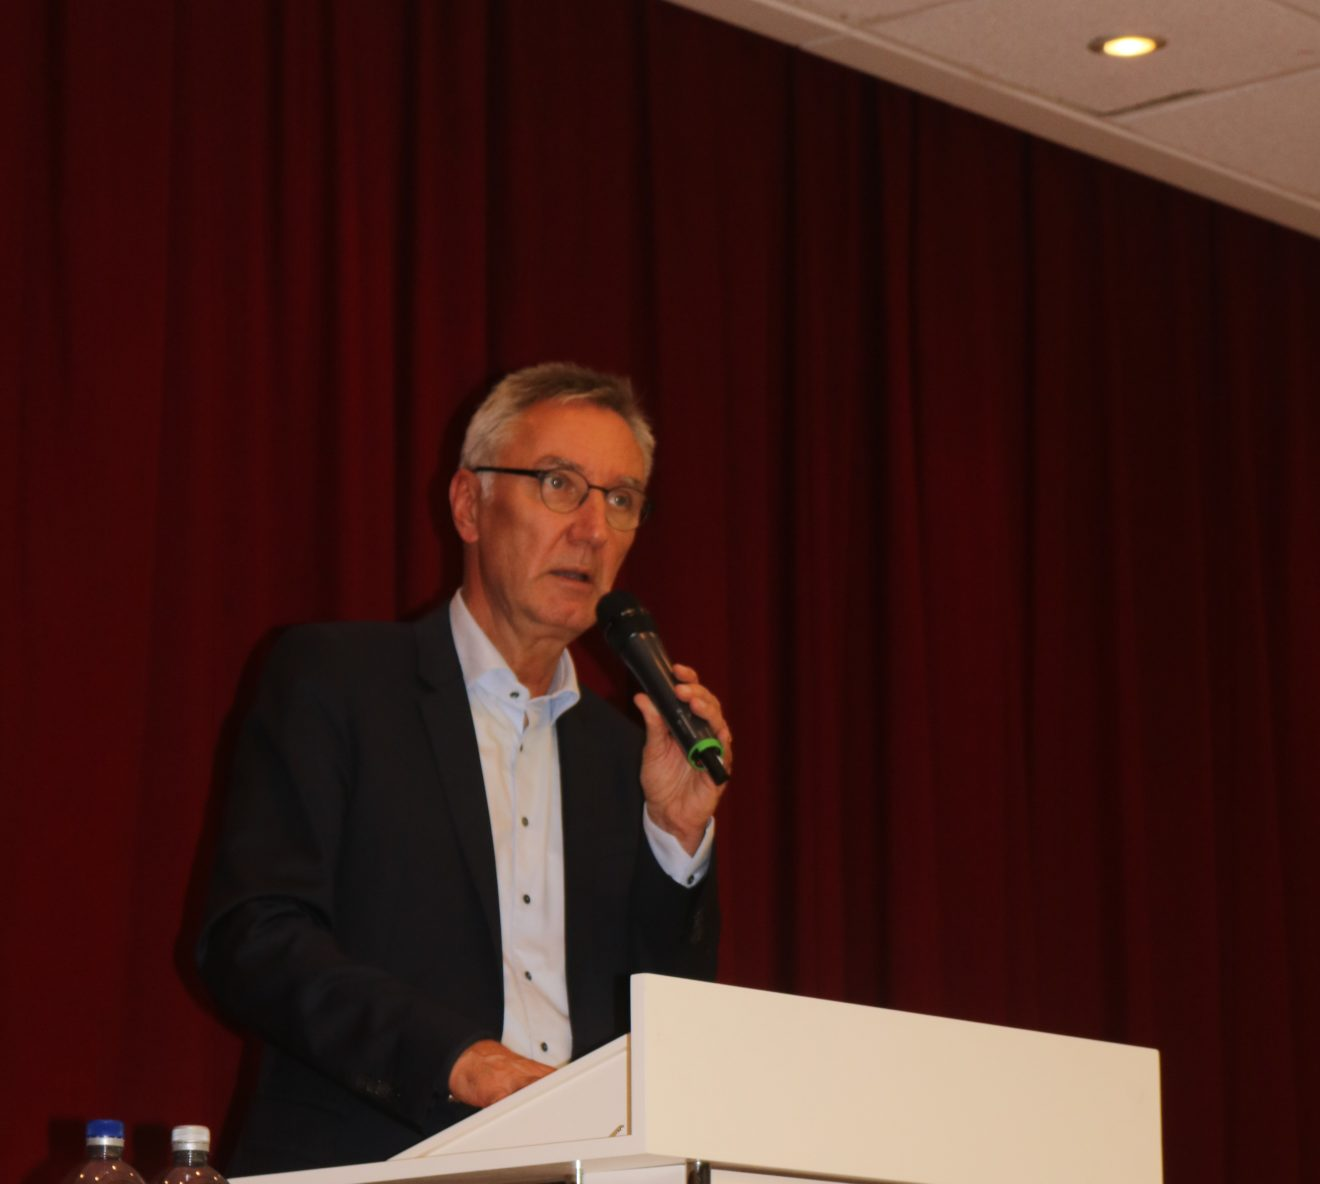 Große Beteiligung am Vortrag mit Professor Schulte-Markwort